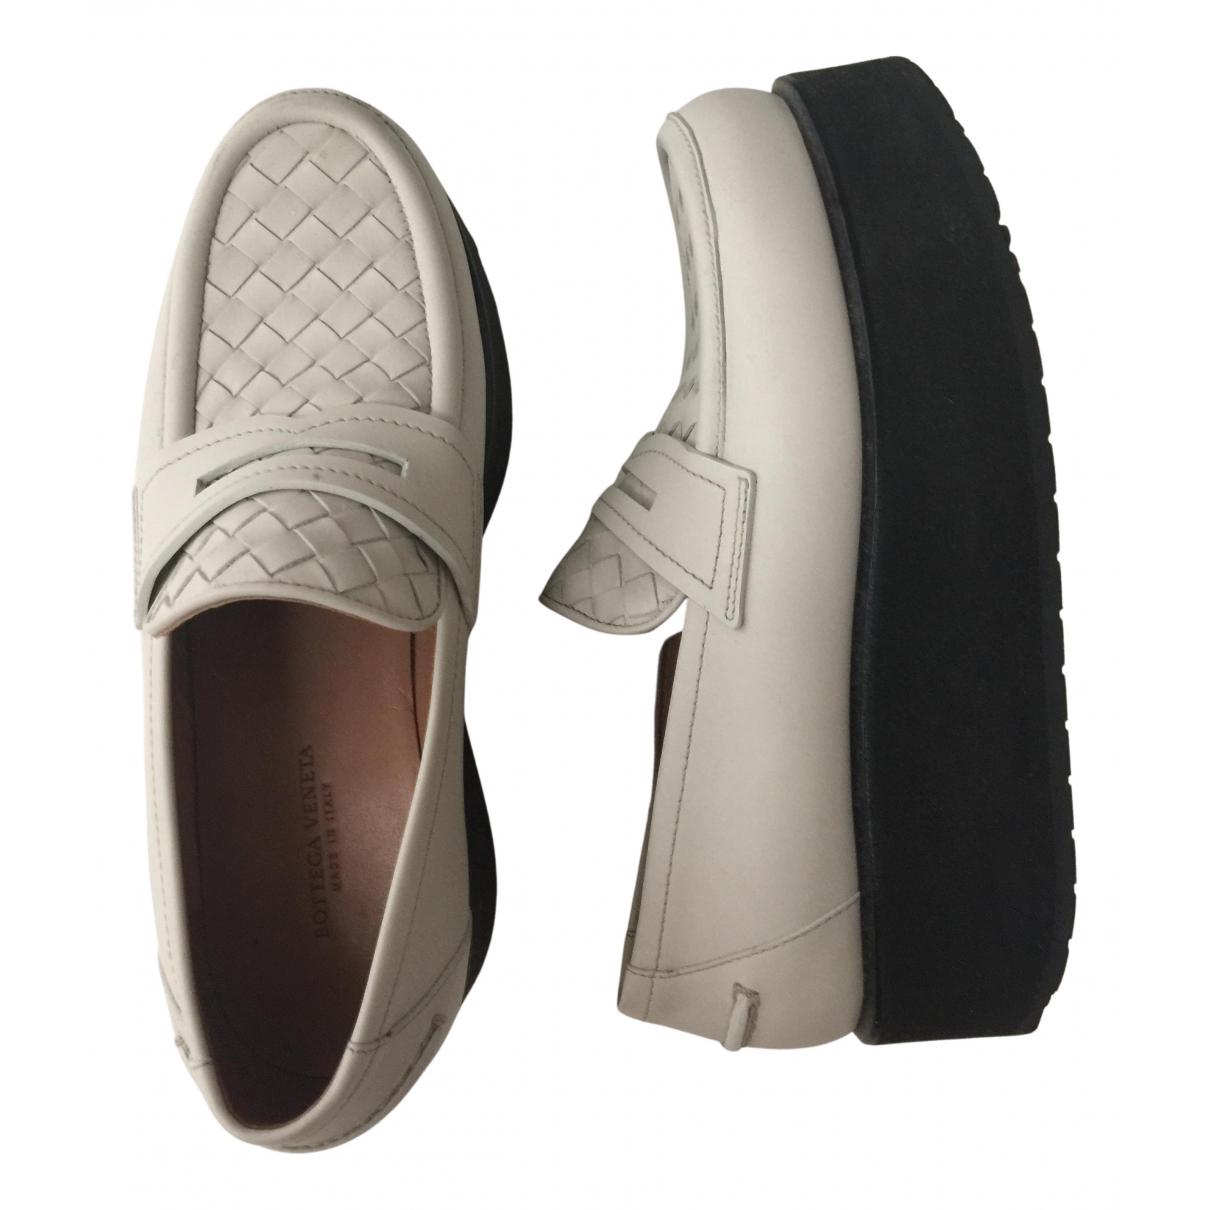 Bottega Veneta N White Leather Flats for Women 35 IT